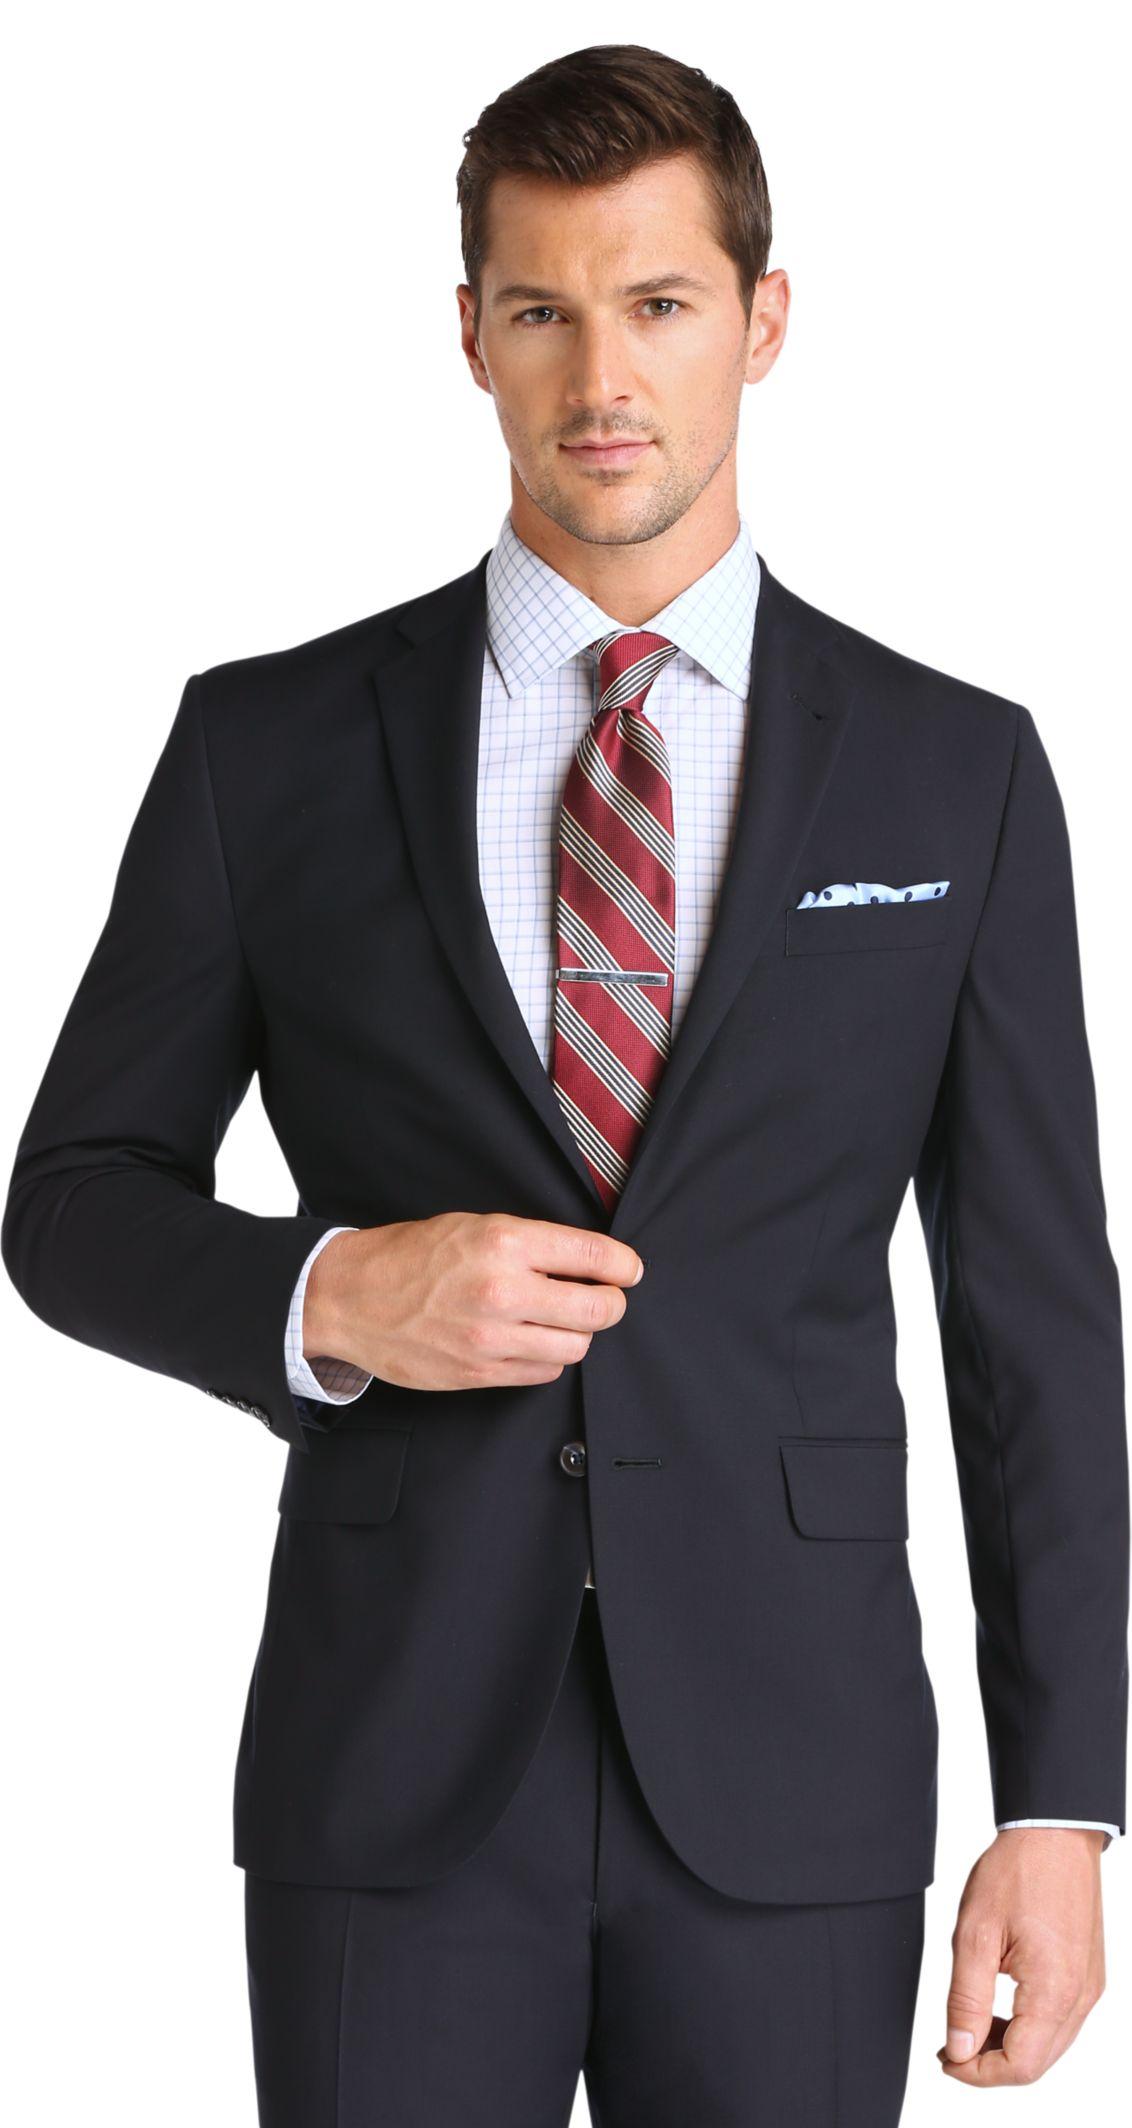 slim fit suits 1905 collection slim fit suit separate jacket FIMVVTK